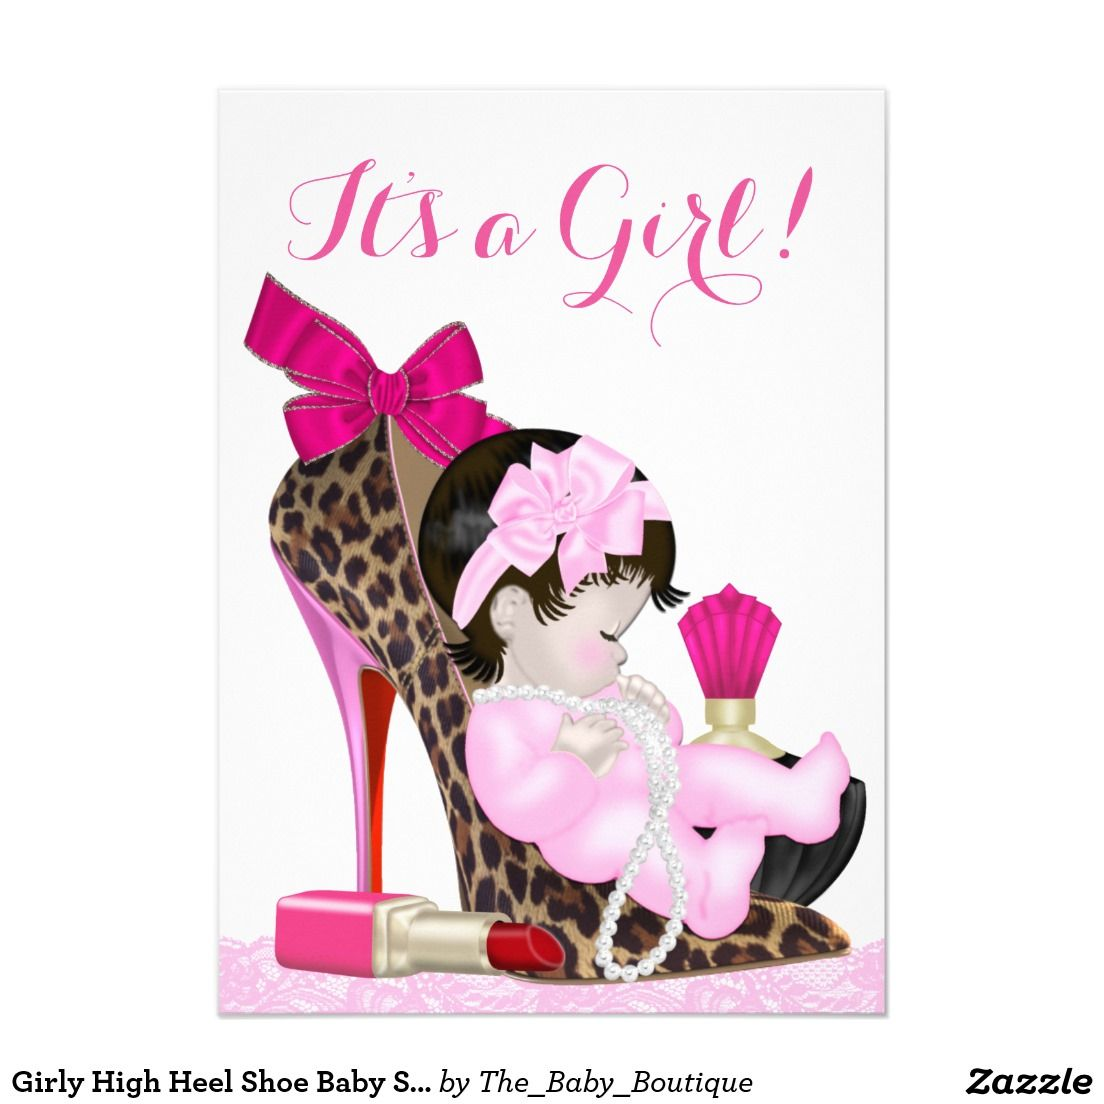 girly high heel shoe baby shower invitation. Black Bedroom Furniture Sets. Home Design Ideas